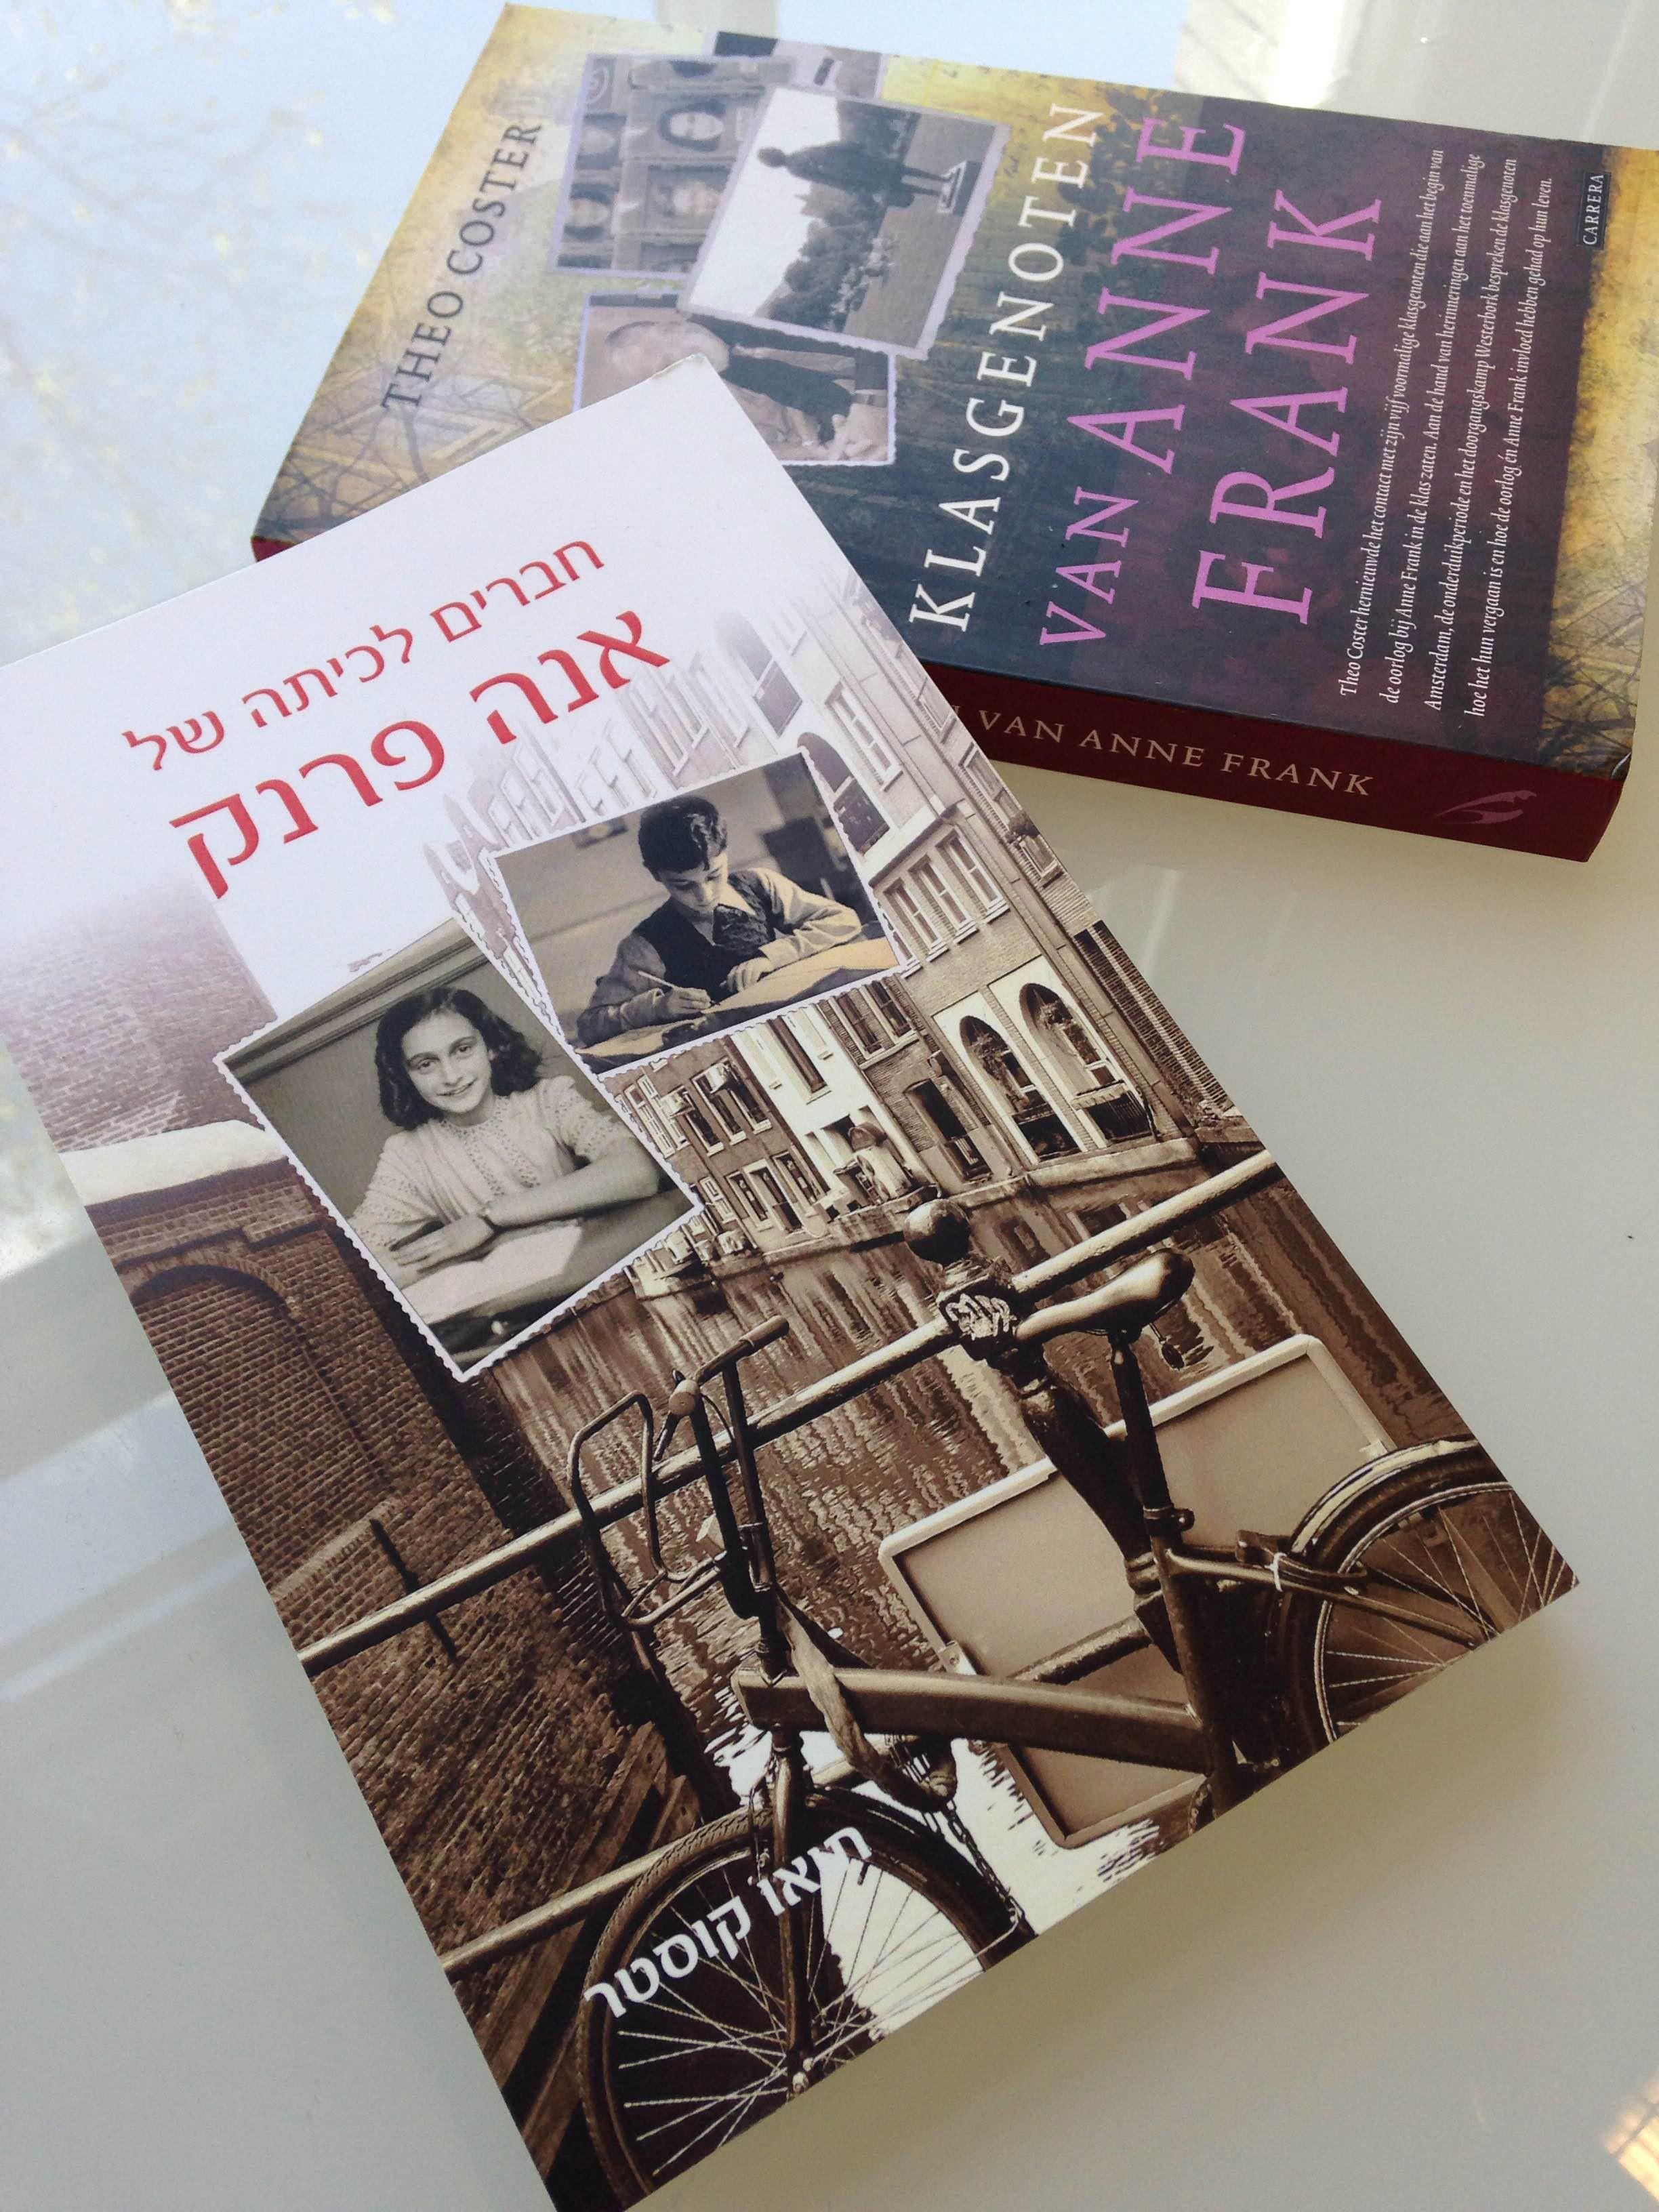 Klasgenoten van Anne Frank_Hebreeuws_Martien Bos